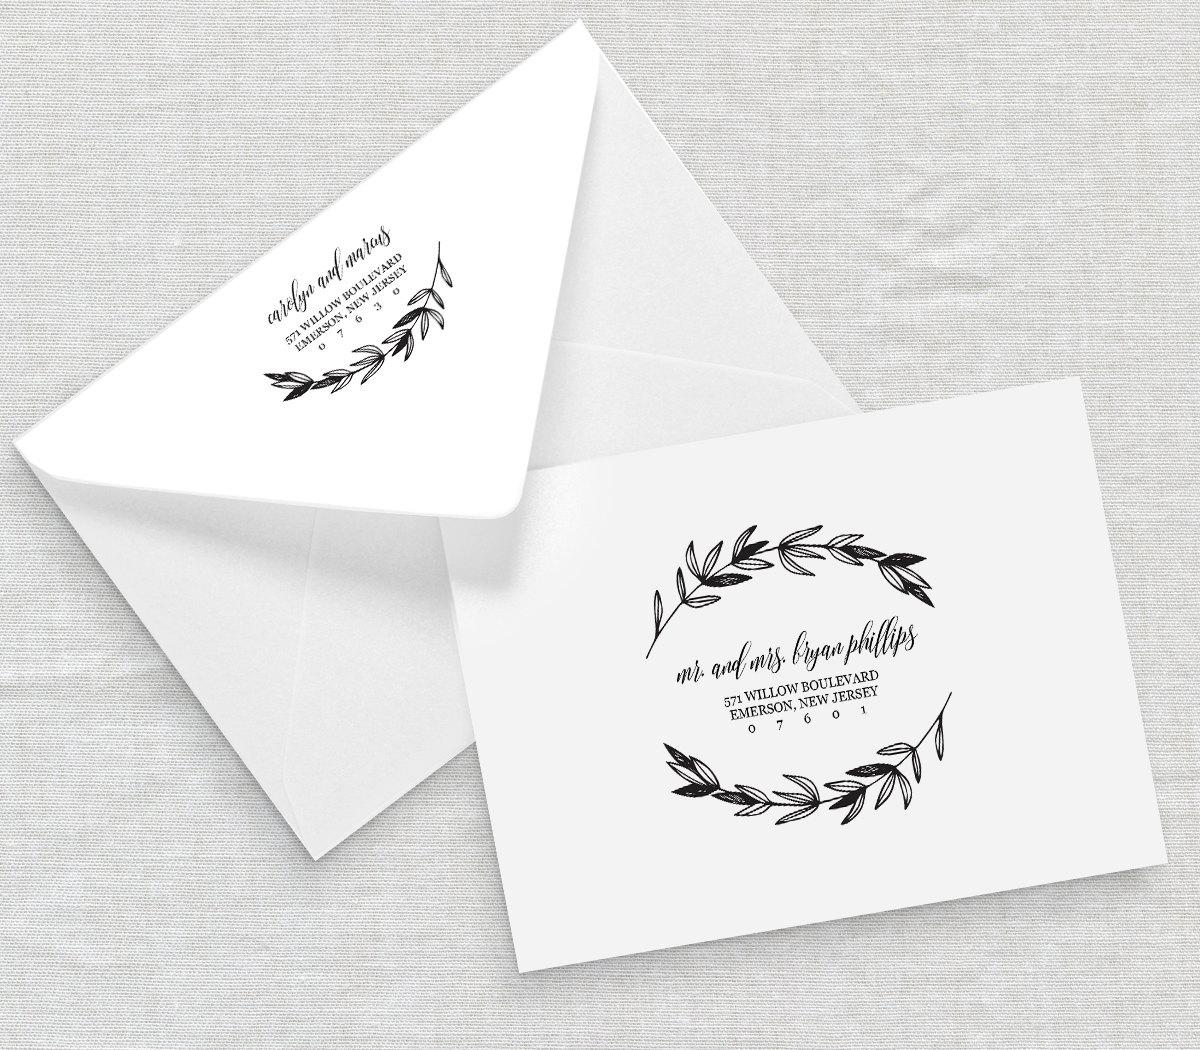 Rustic wedding calligraphy envelope addressing template